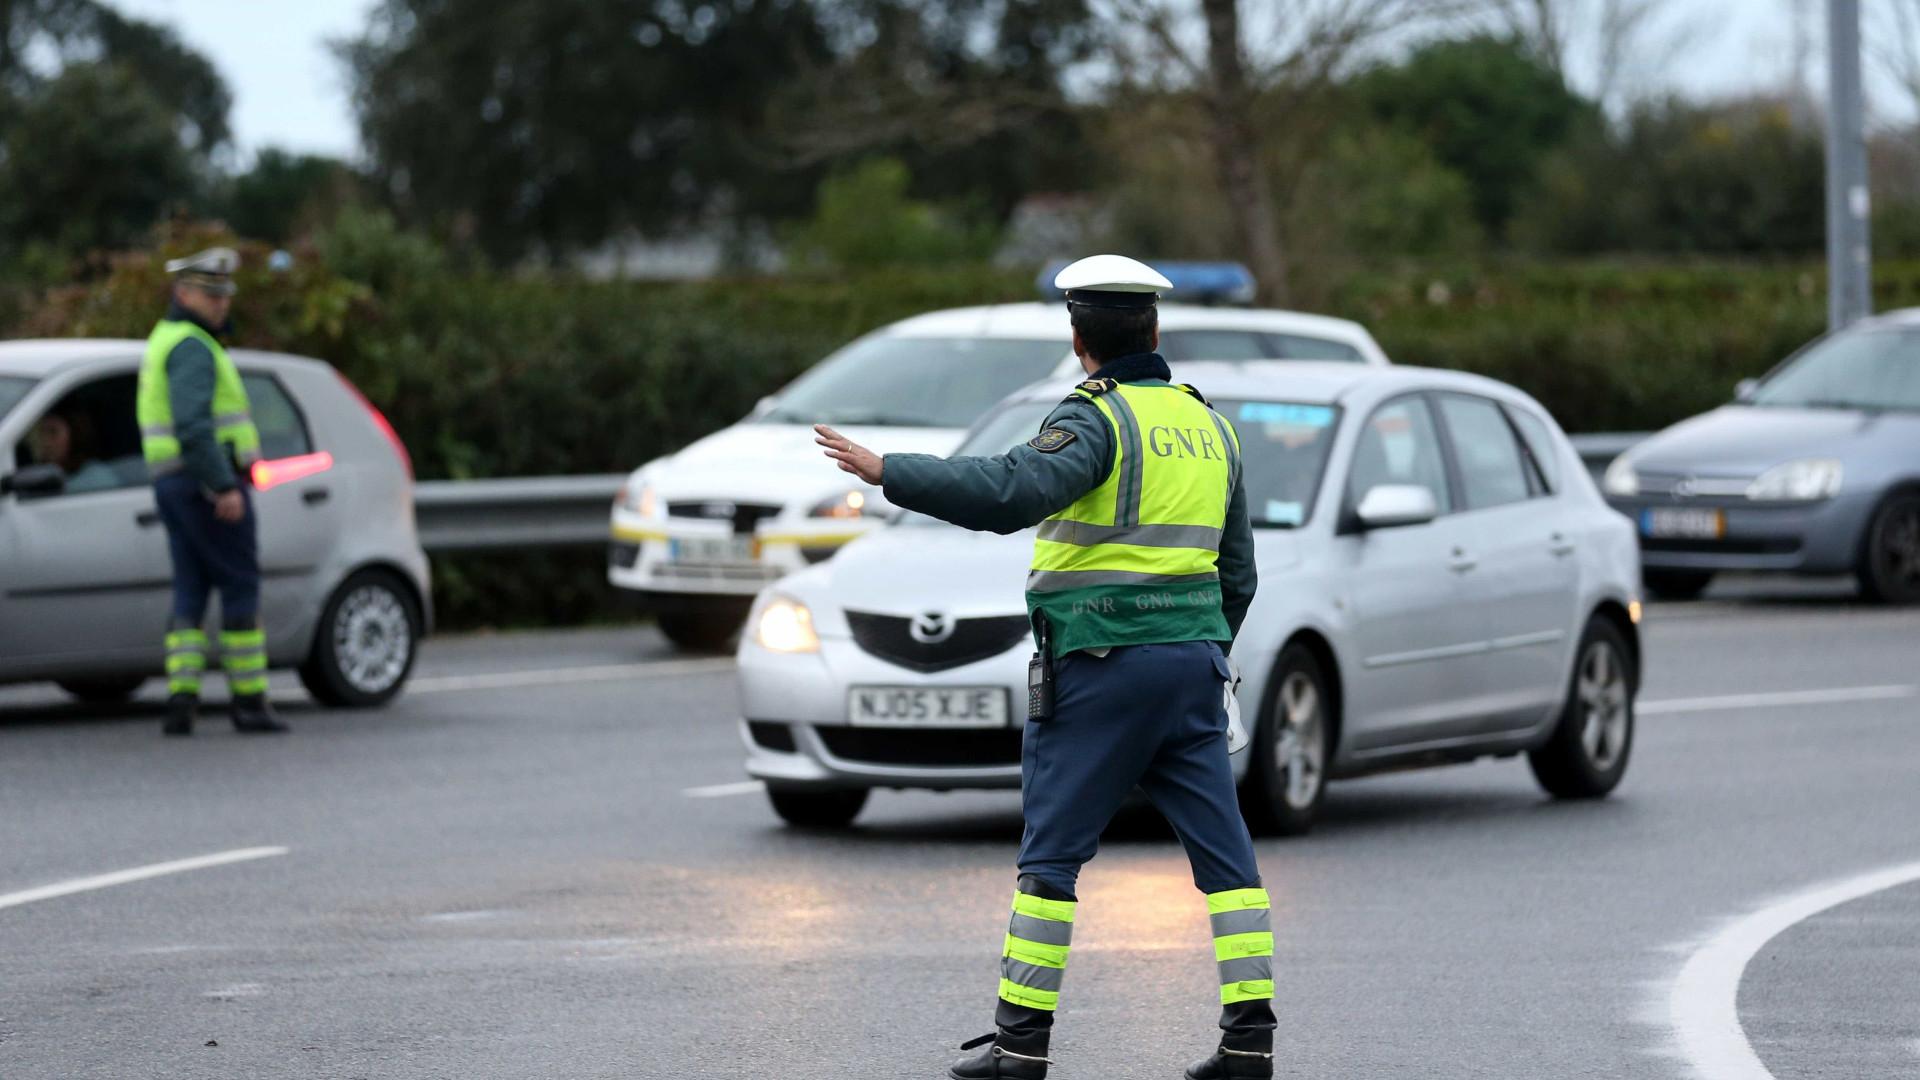 Suspeito de tentativa de homicídio de dois GNR entregue a Portugal